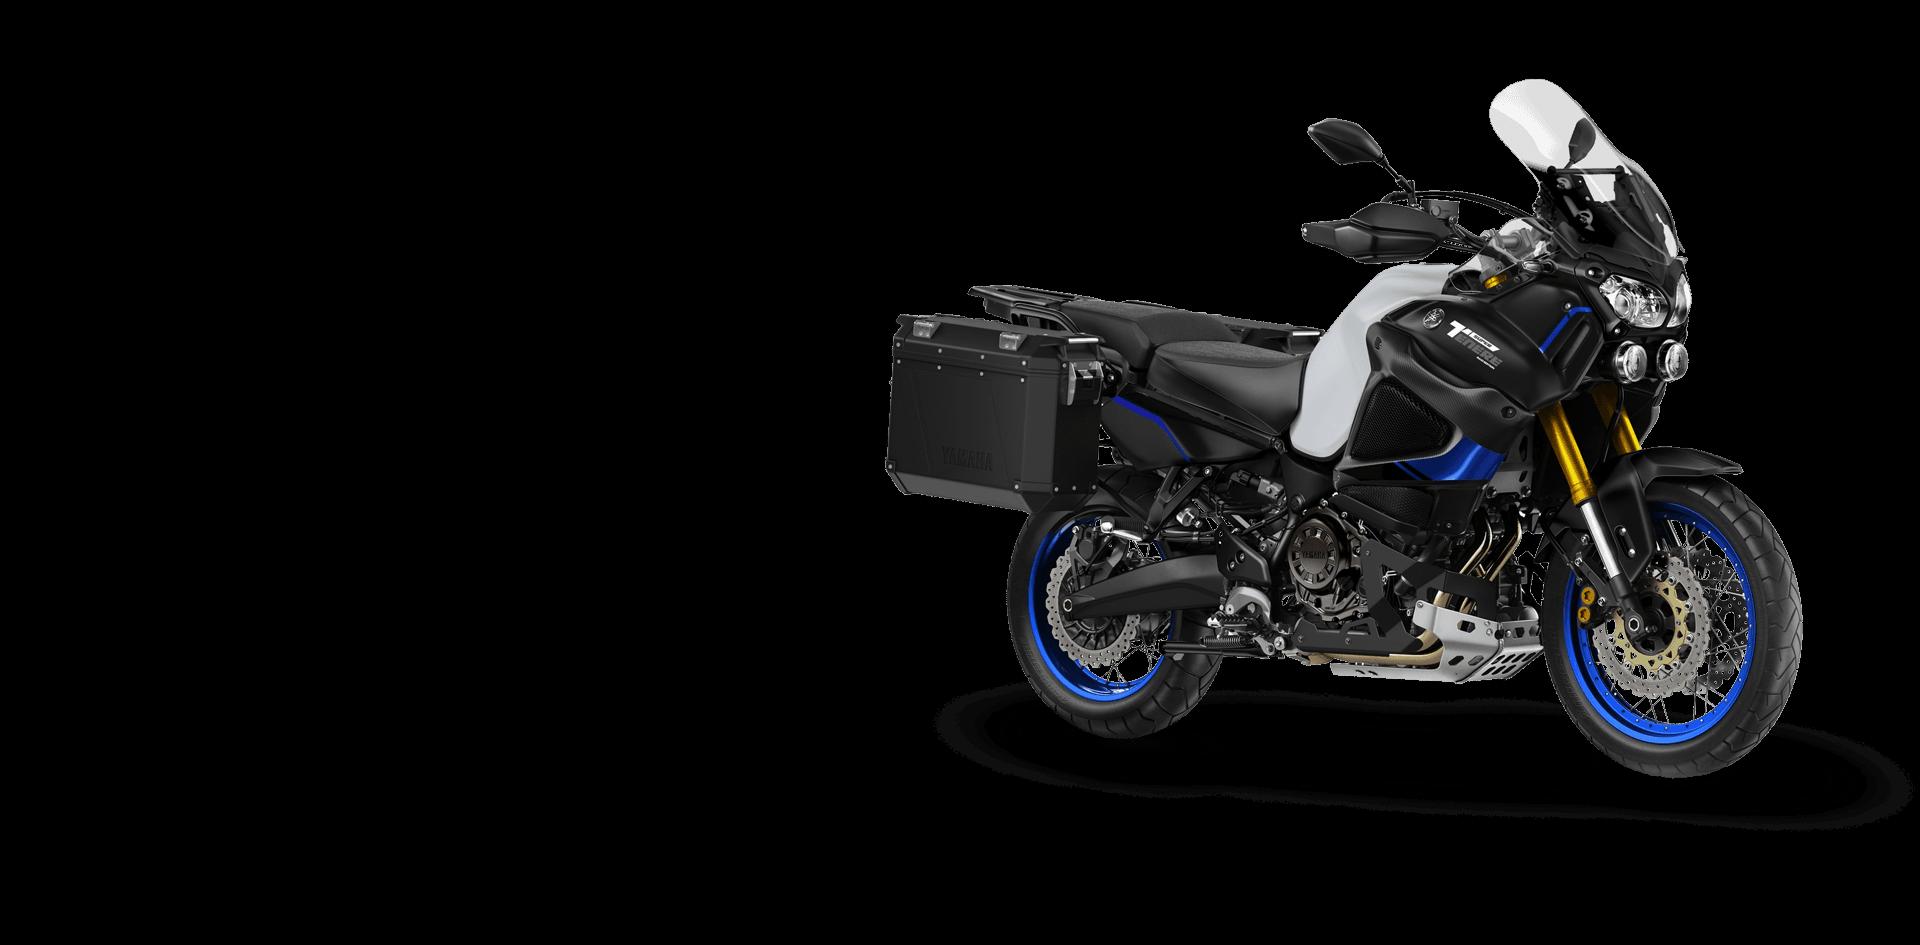 CocMotors - Yamaha XTZ 1200 Raid Edition